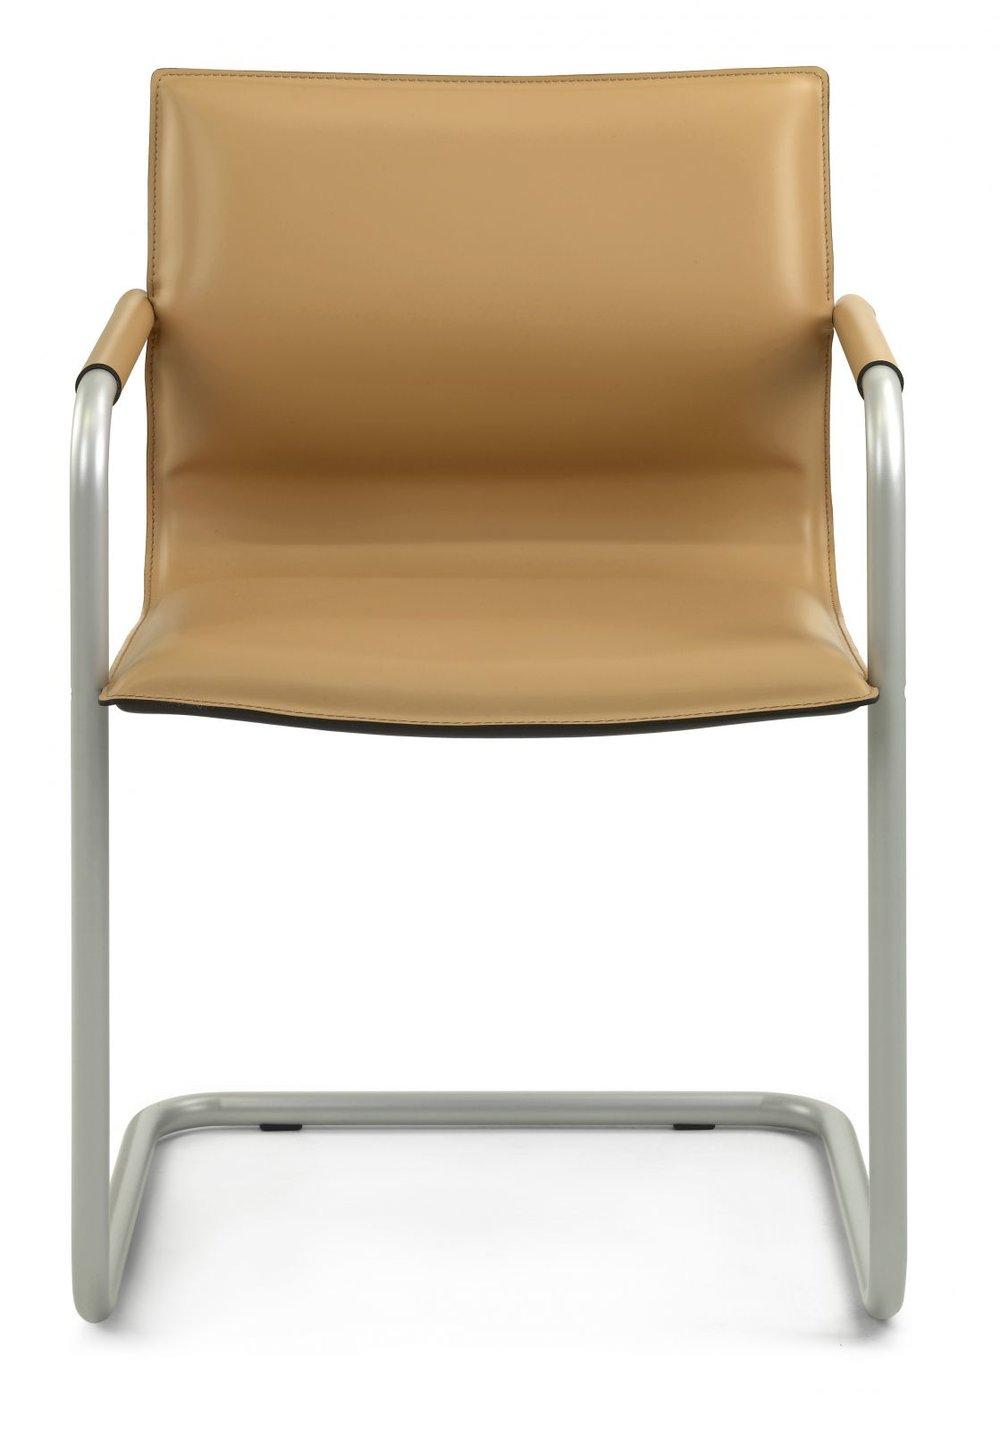 modern-office-furniture-chairs-Italian-designer-furniture (3).jpg